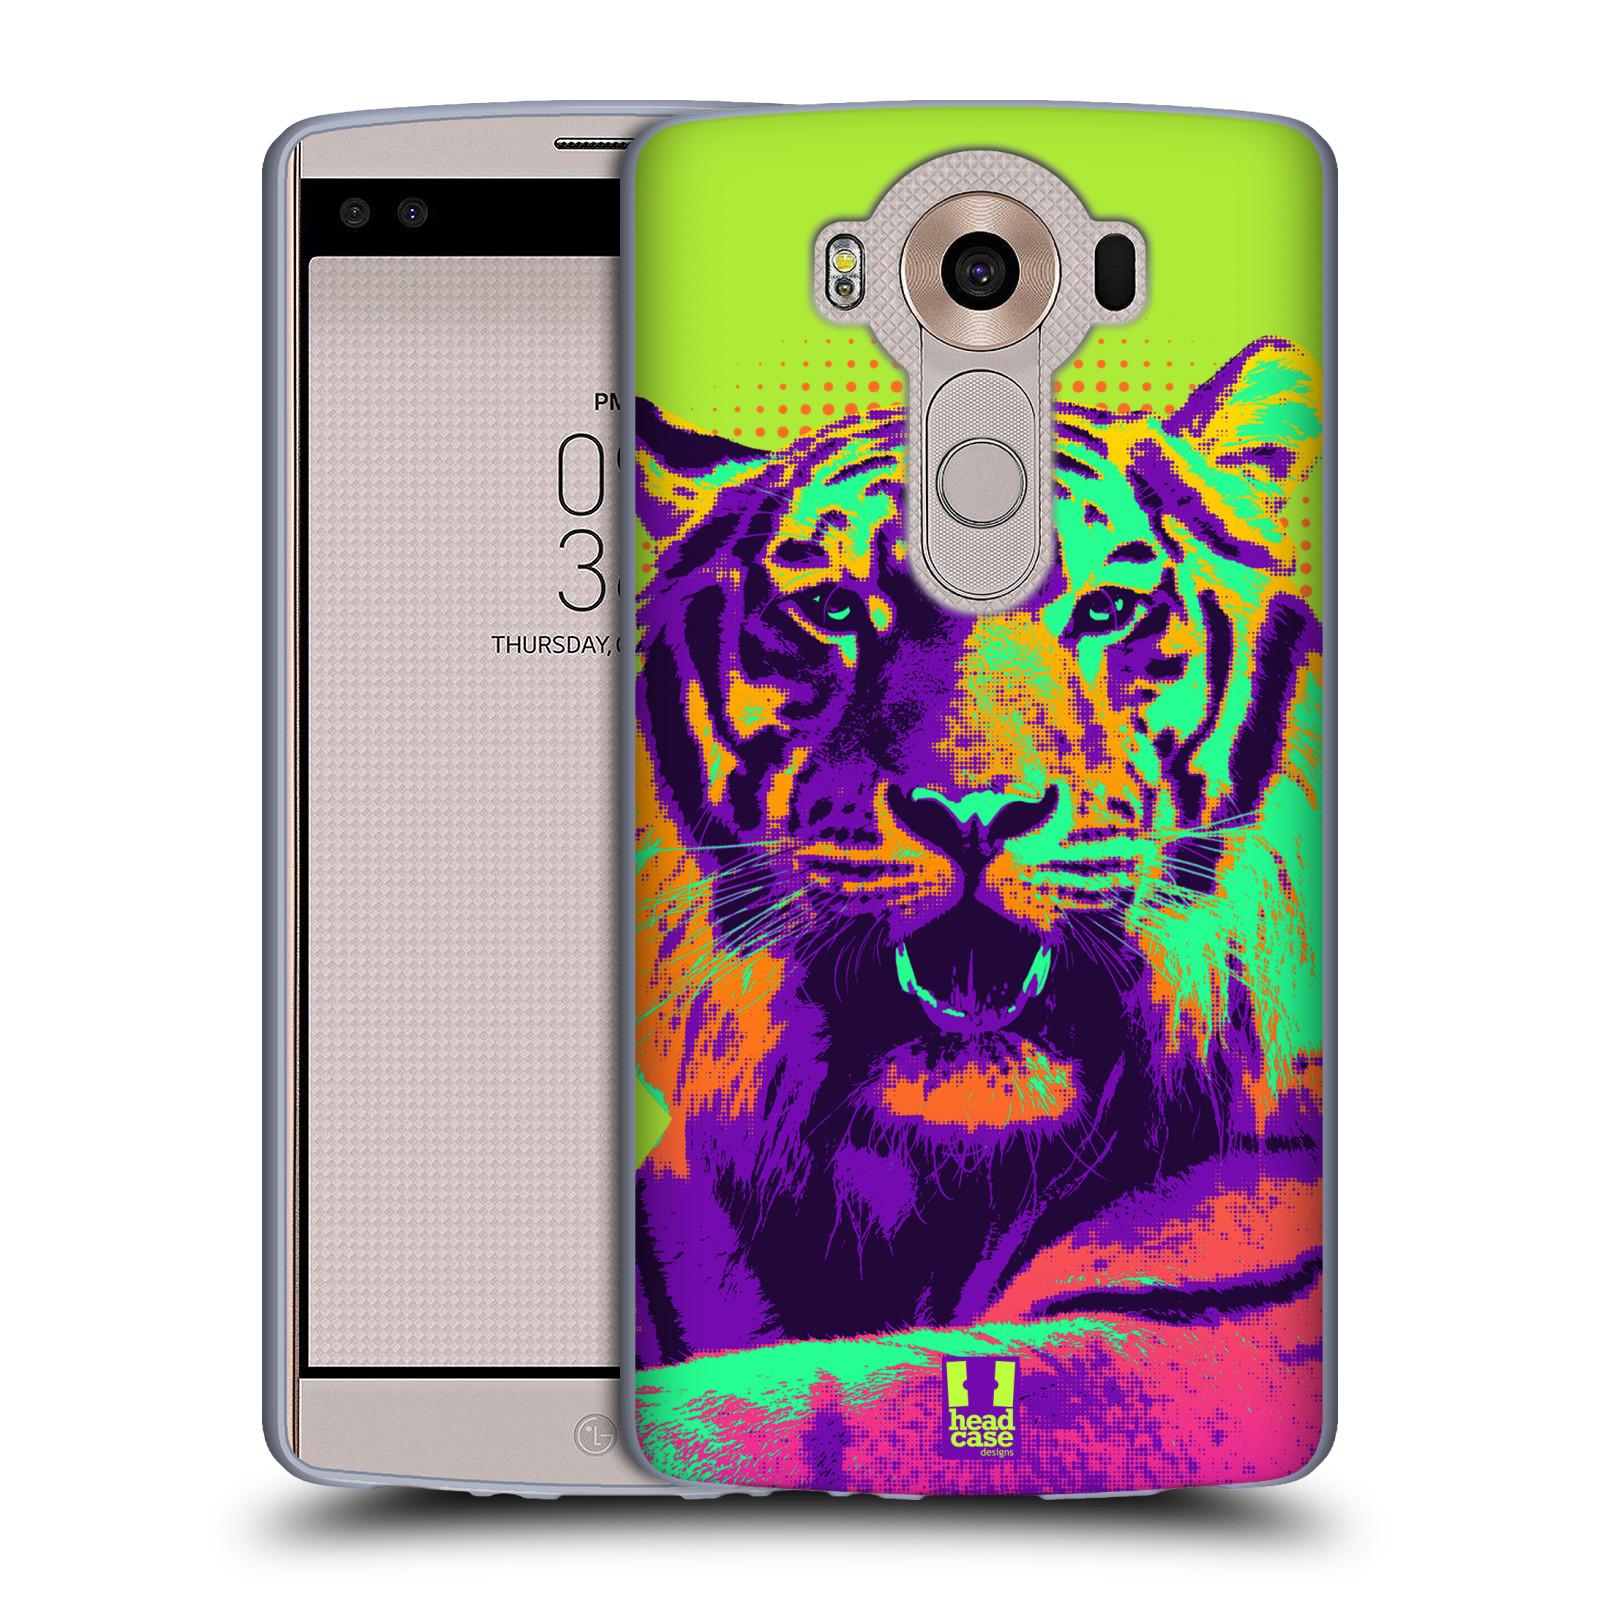 Silikonové pouzdro na mobil LG V10 HEAD CASE POP PRINT TYGR (Silikonový kryt či obal na mobilní telefon LG V10 H960 / H960A)